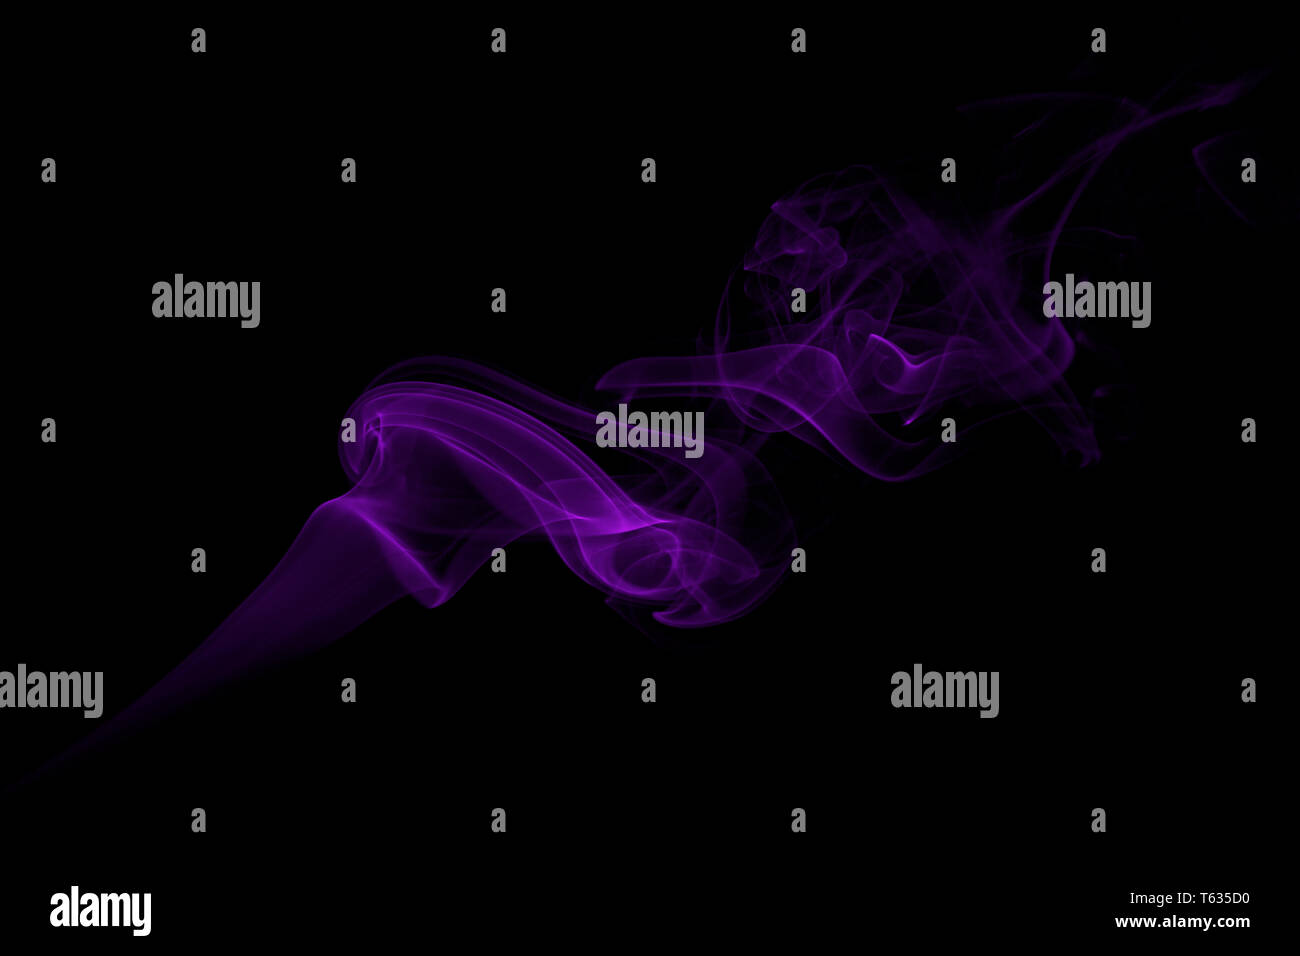 Purple Smoke on a Black Background - Stock Image